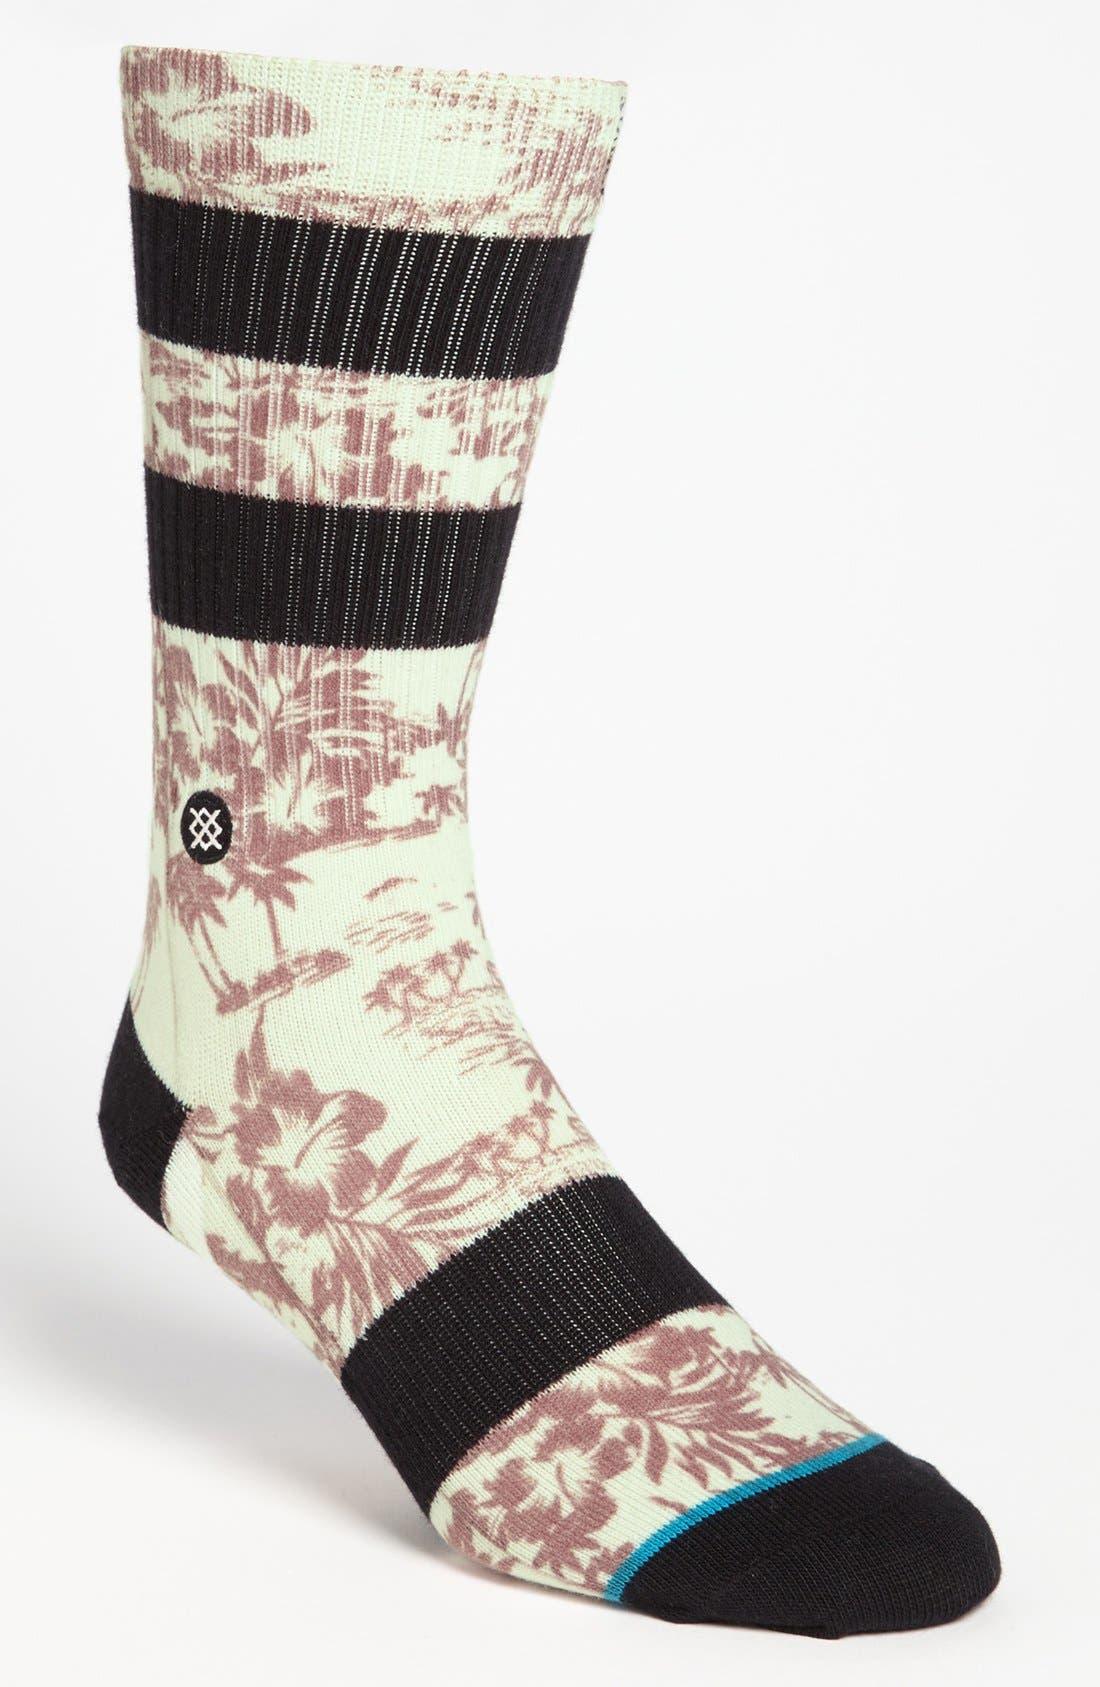 Main Image - Stance 'Waipio' Dress Socks